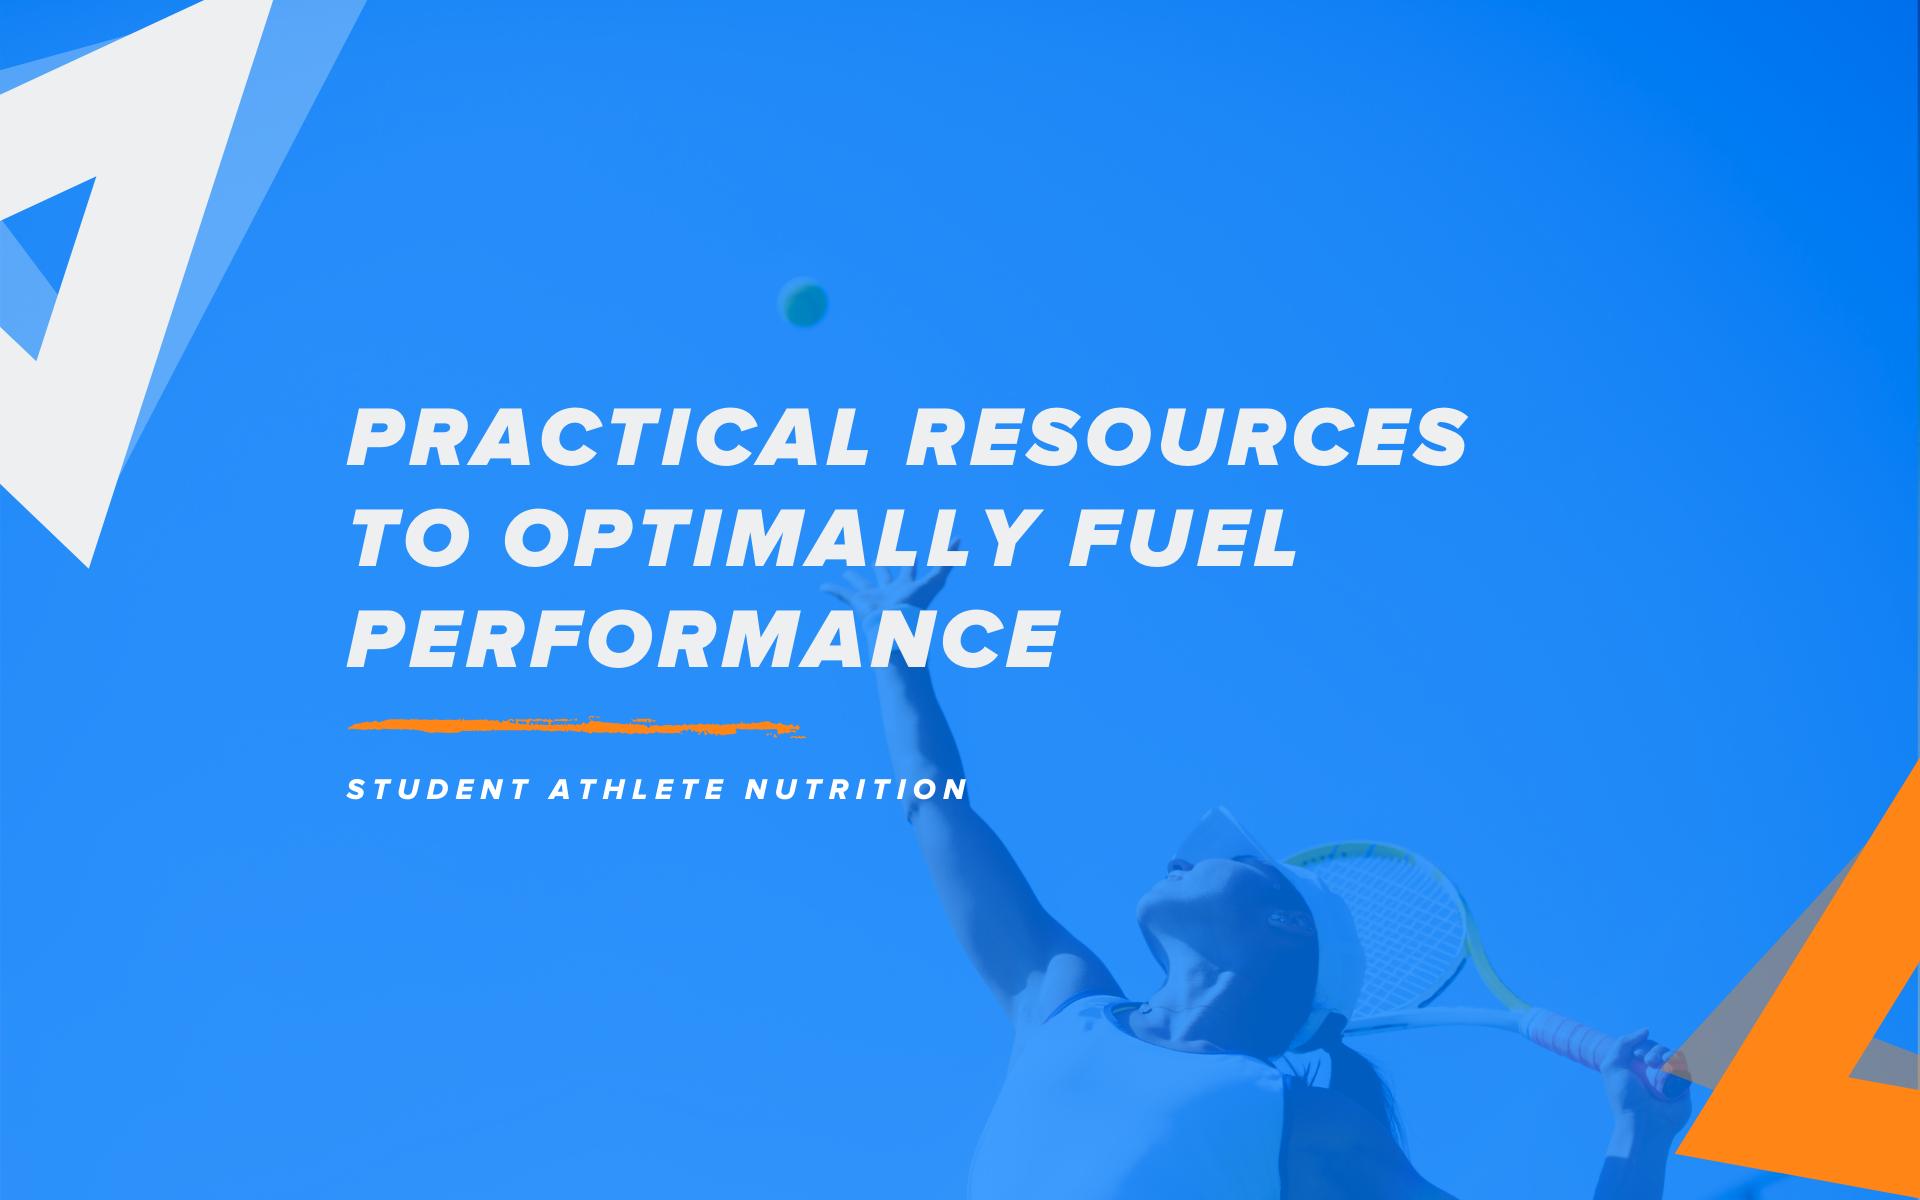 student athlete nutrition